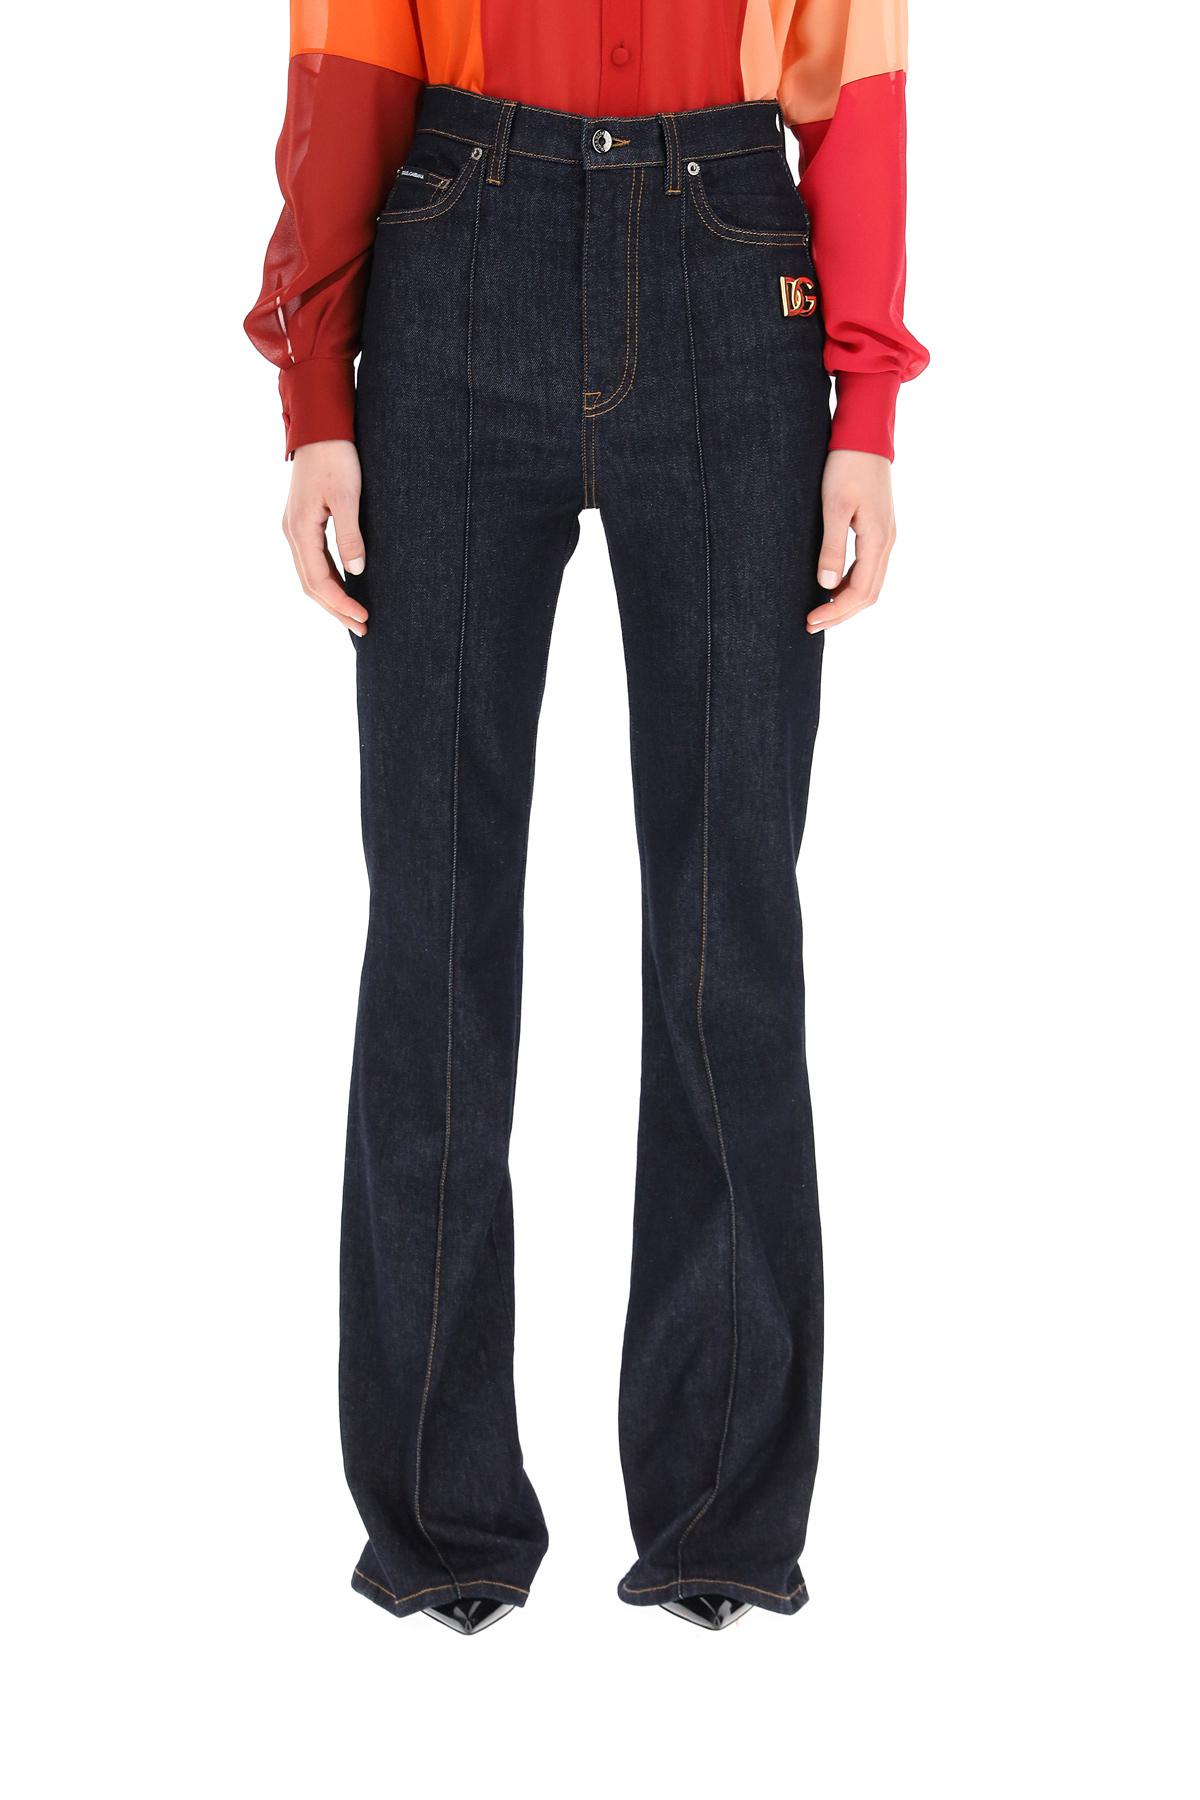 Dolce & gabbana jeans bootcut a vita alta